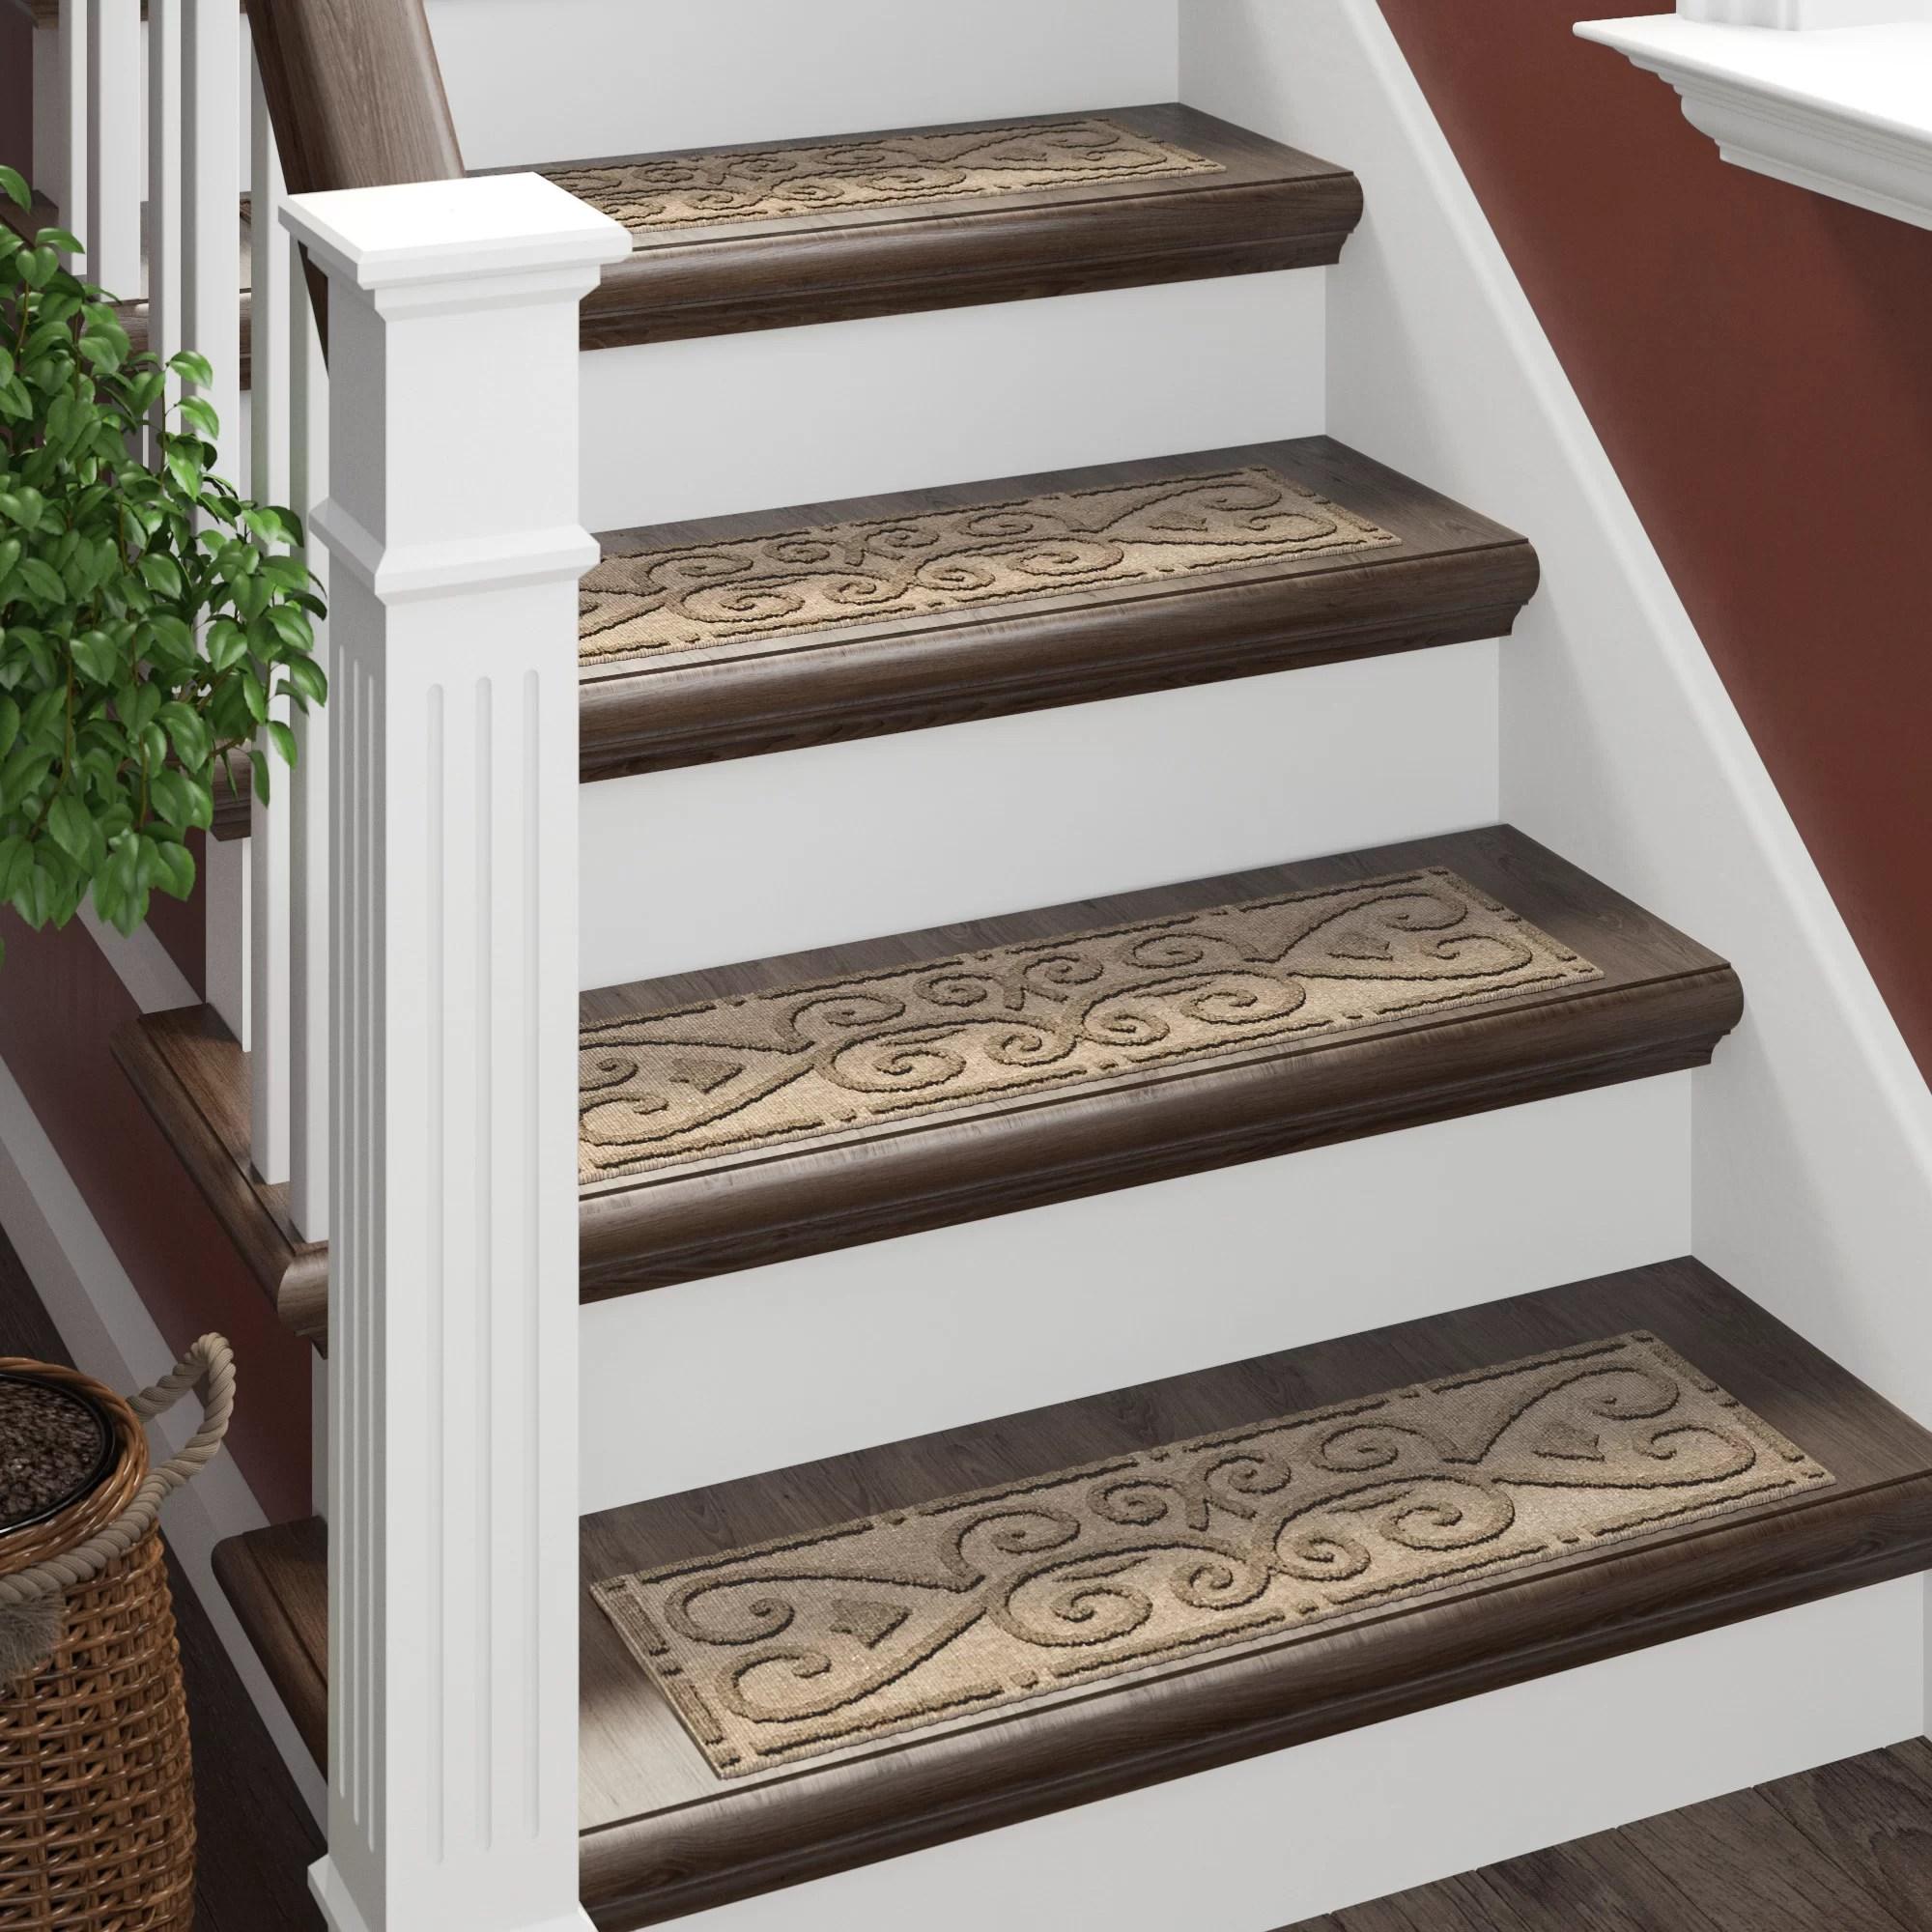 Tucker Murphy™ Pet Beauvais Scroll Stair Tread Reviews Wayfair   Wayfair Stair Tread Rugs   Astoria Grand   Beige Carpet   Lis Living   Bullnose Carpet   Non Slip Stair